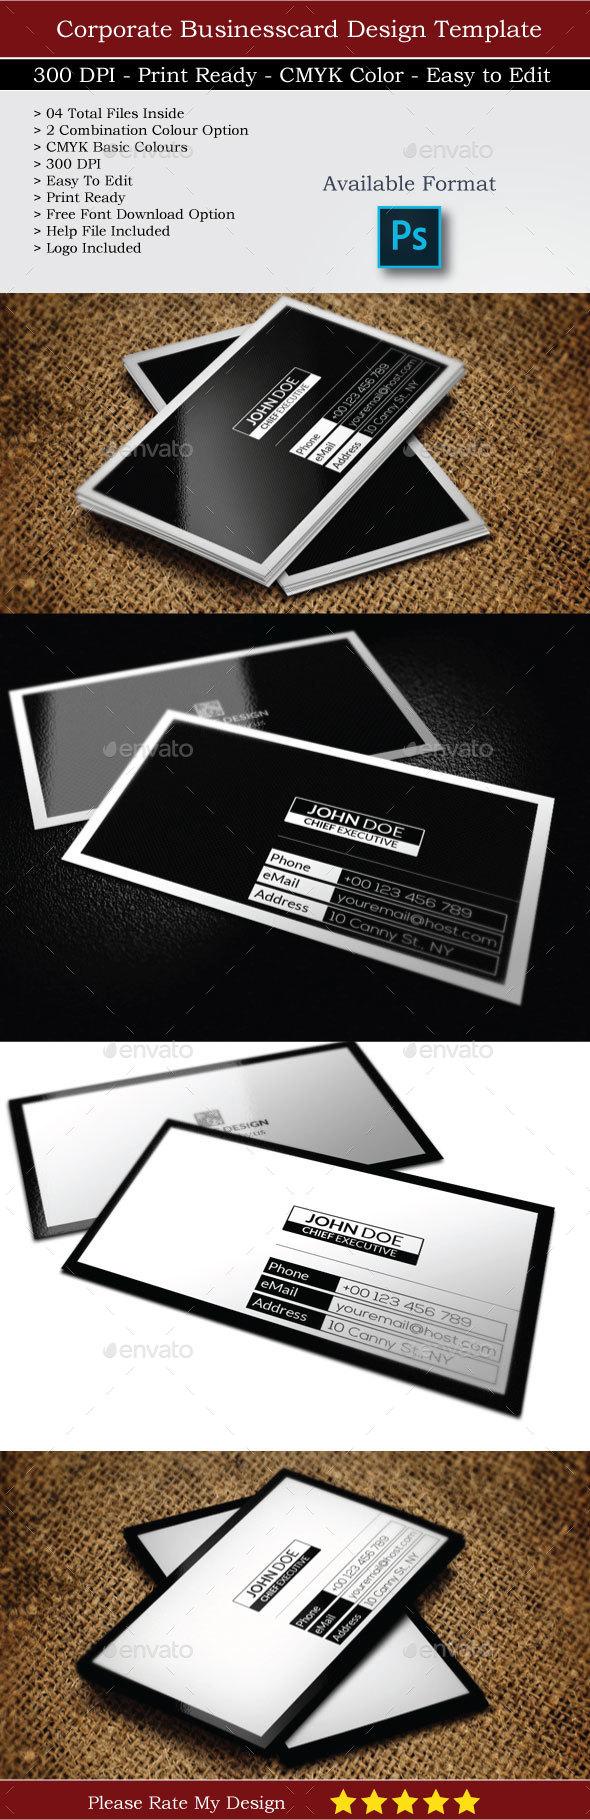 Creative Corporate Business Card Design - Business Cards Print Templates